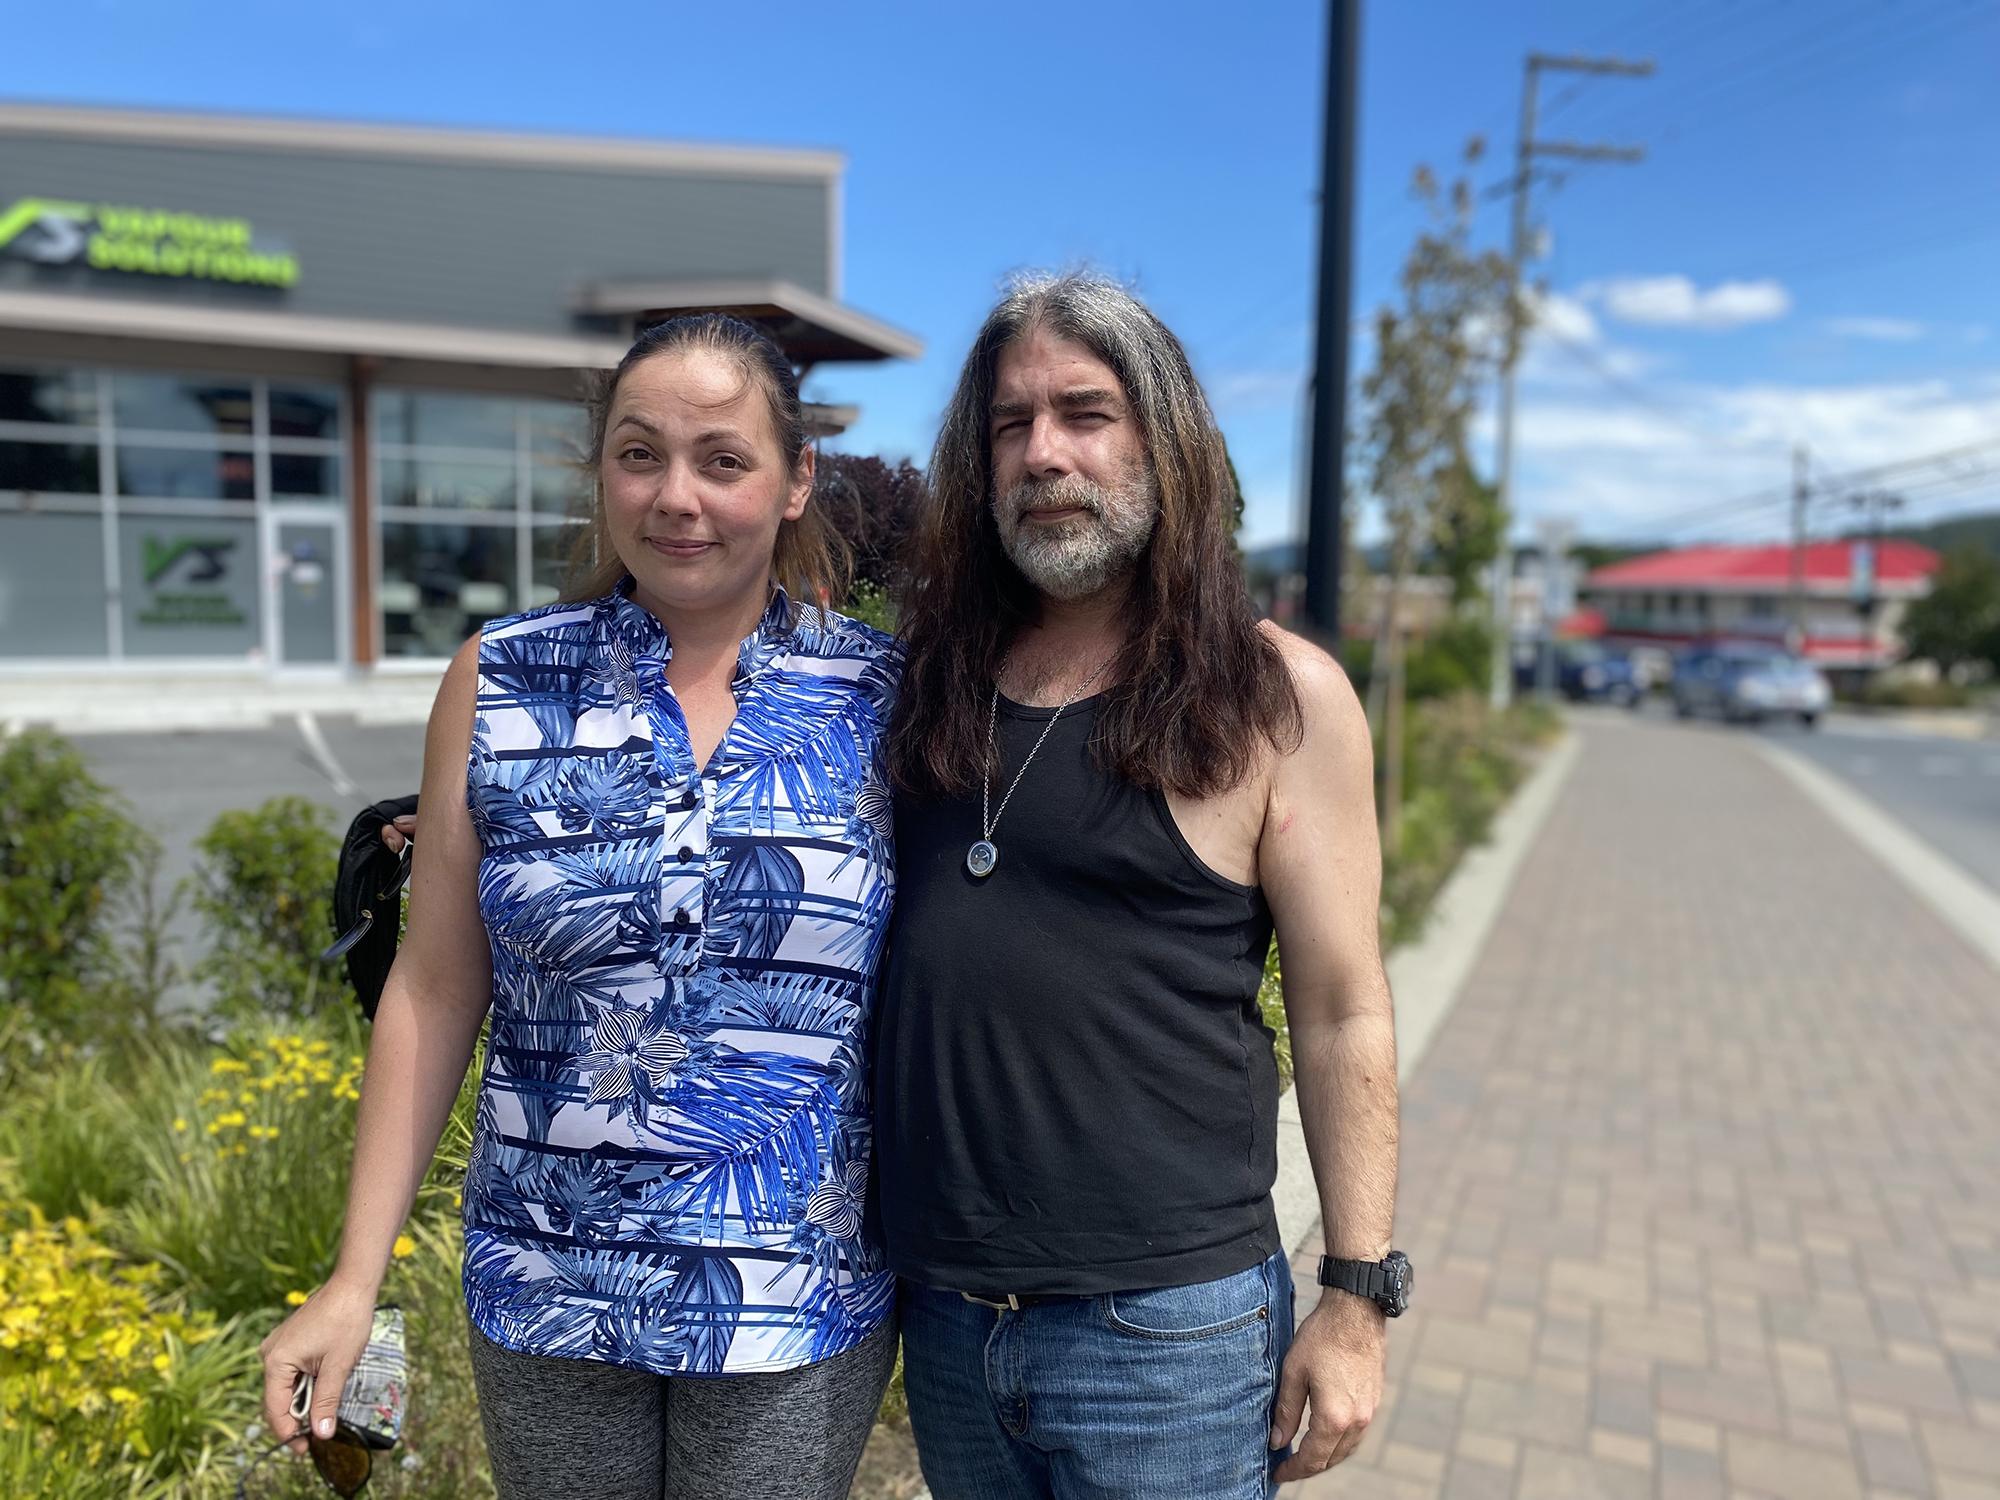 How a Sooke family fell through the cracks and into hidden homelessness